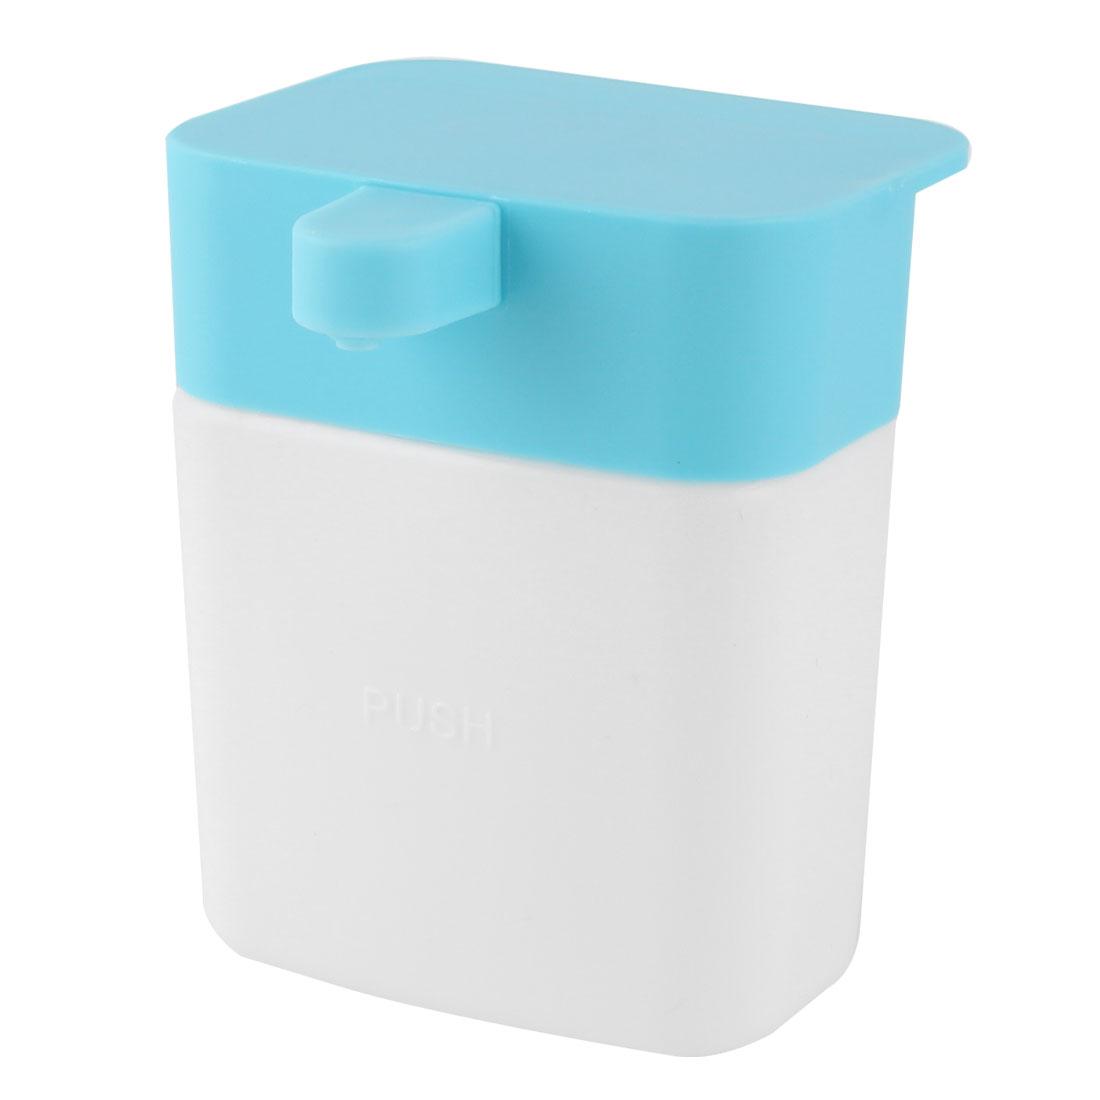 Household Kitchen Plastic Dishwashing Liquid Suction Cup Storage Box Holder Blue 200ml